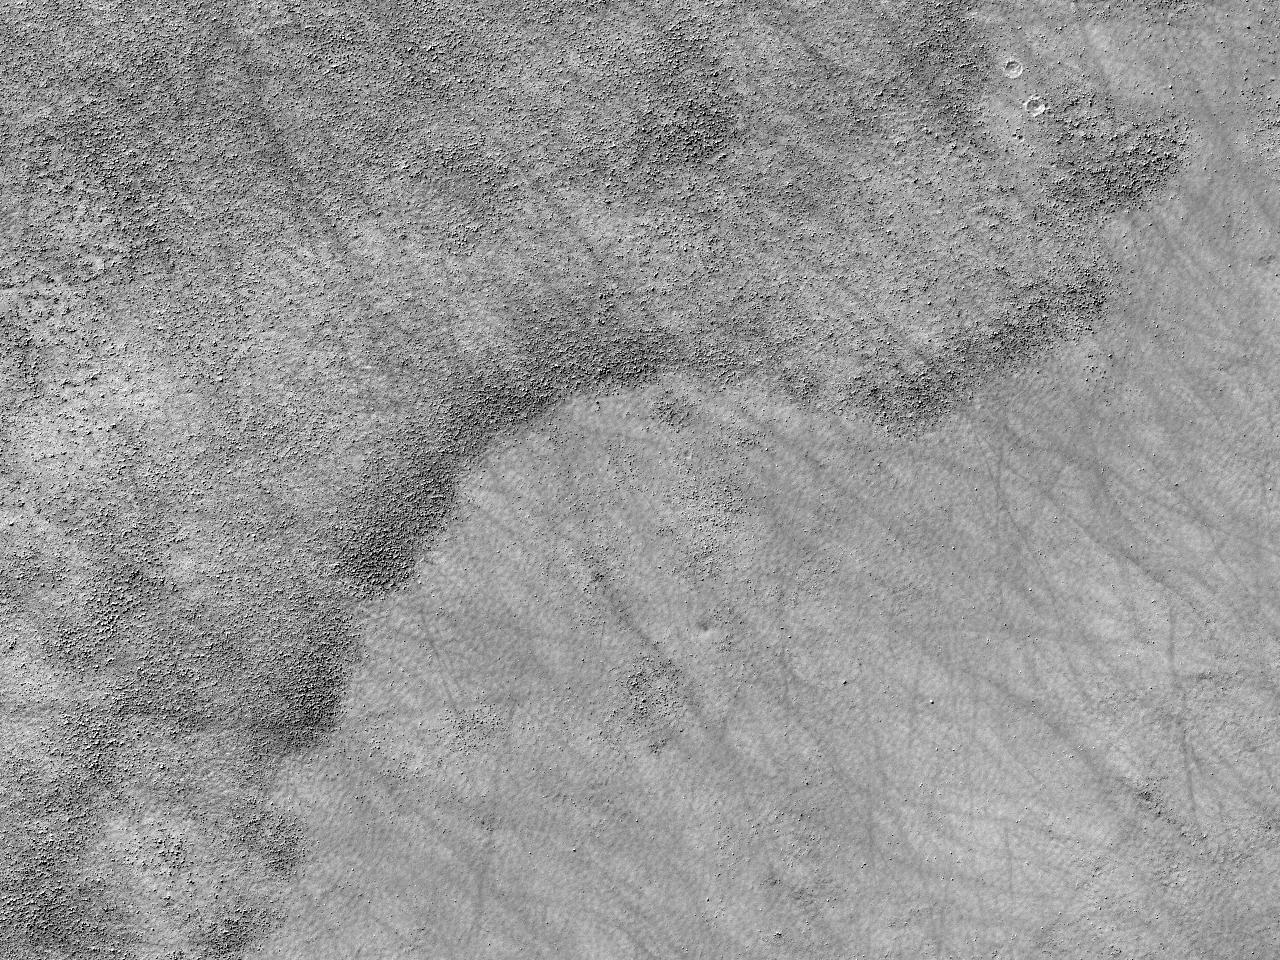 Рельеф земли Terra Cimmeria